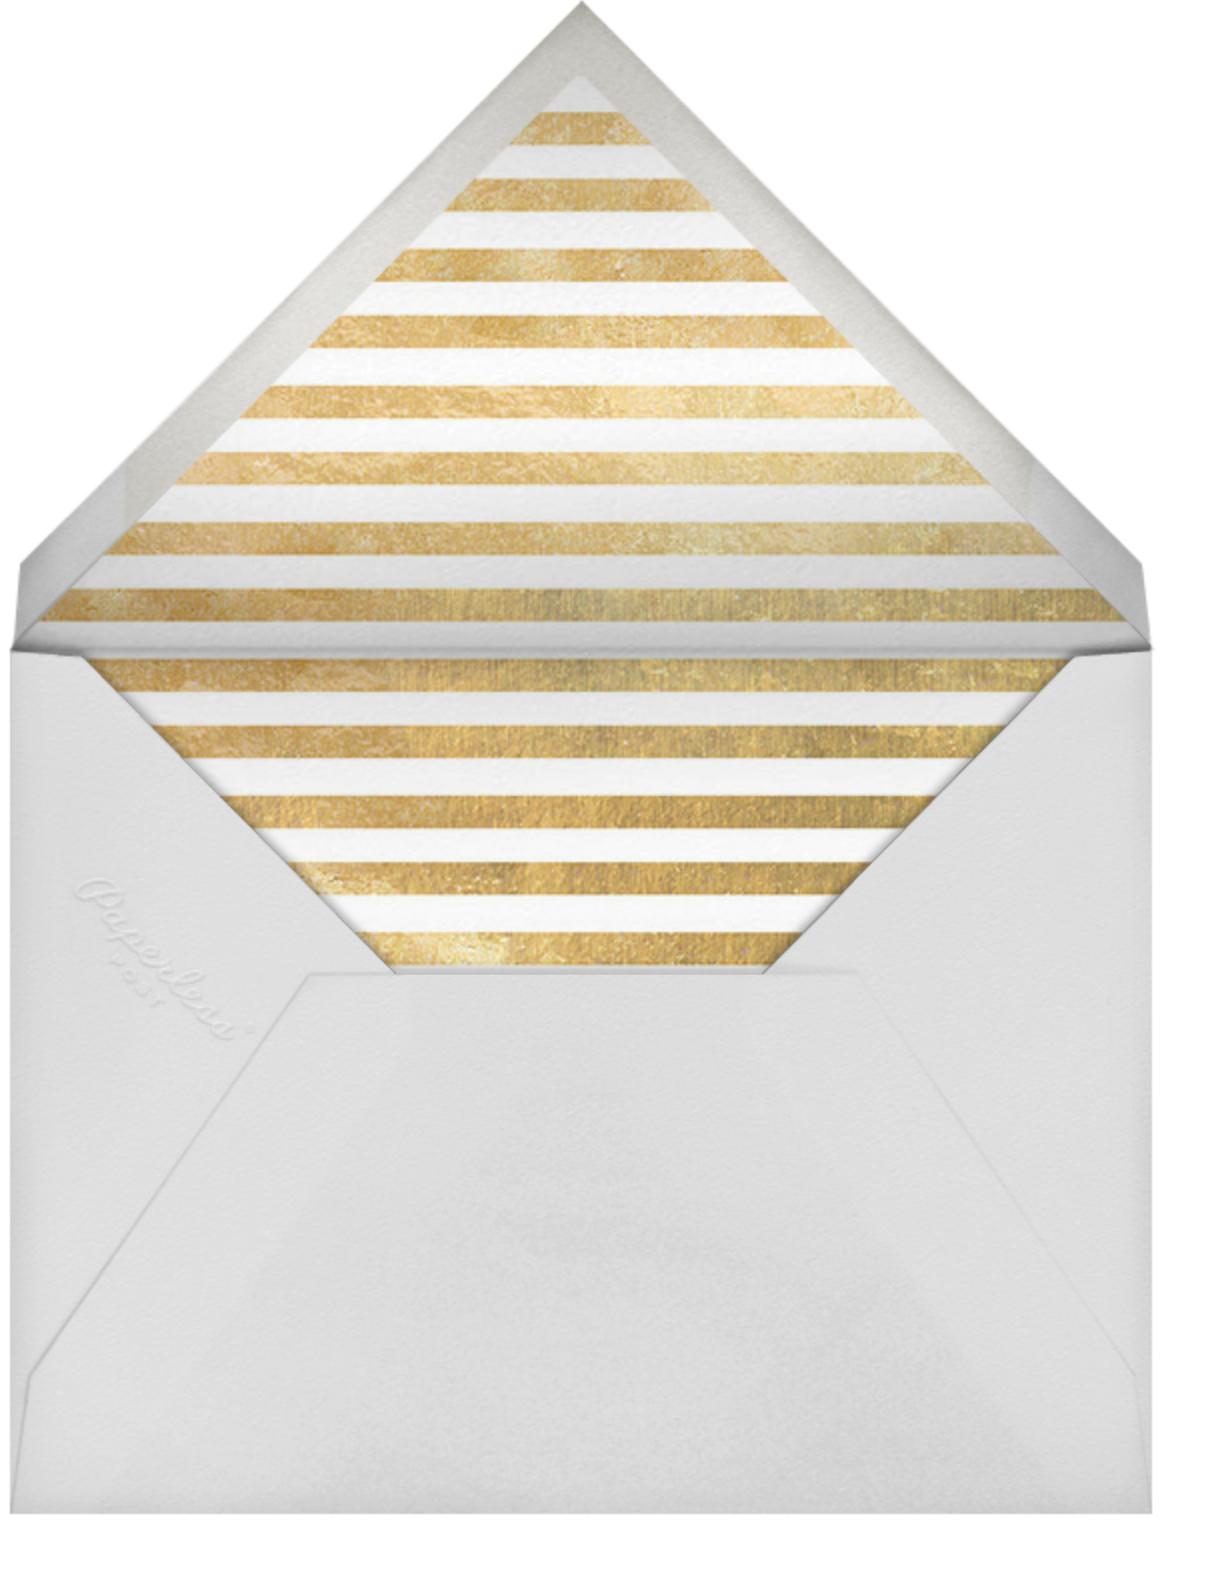 Prism - Multi - kate spade new york - Save the date - envelope back